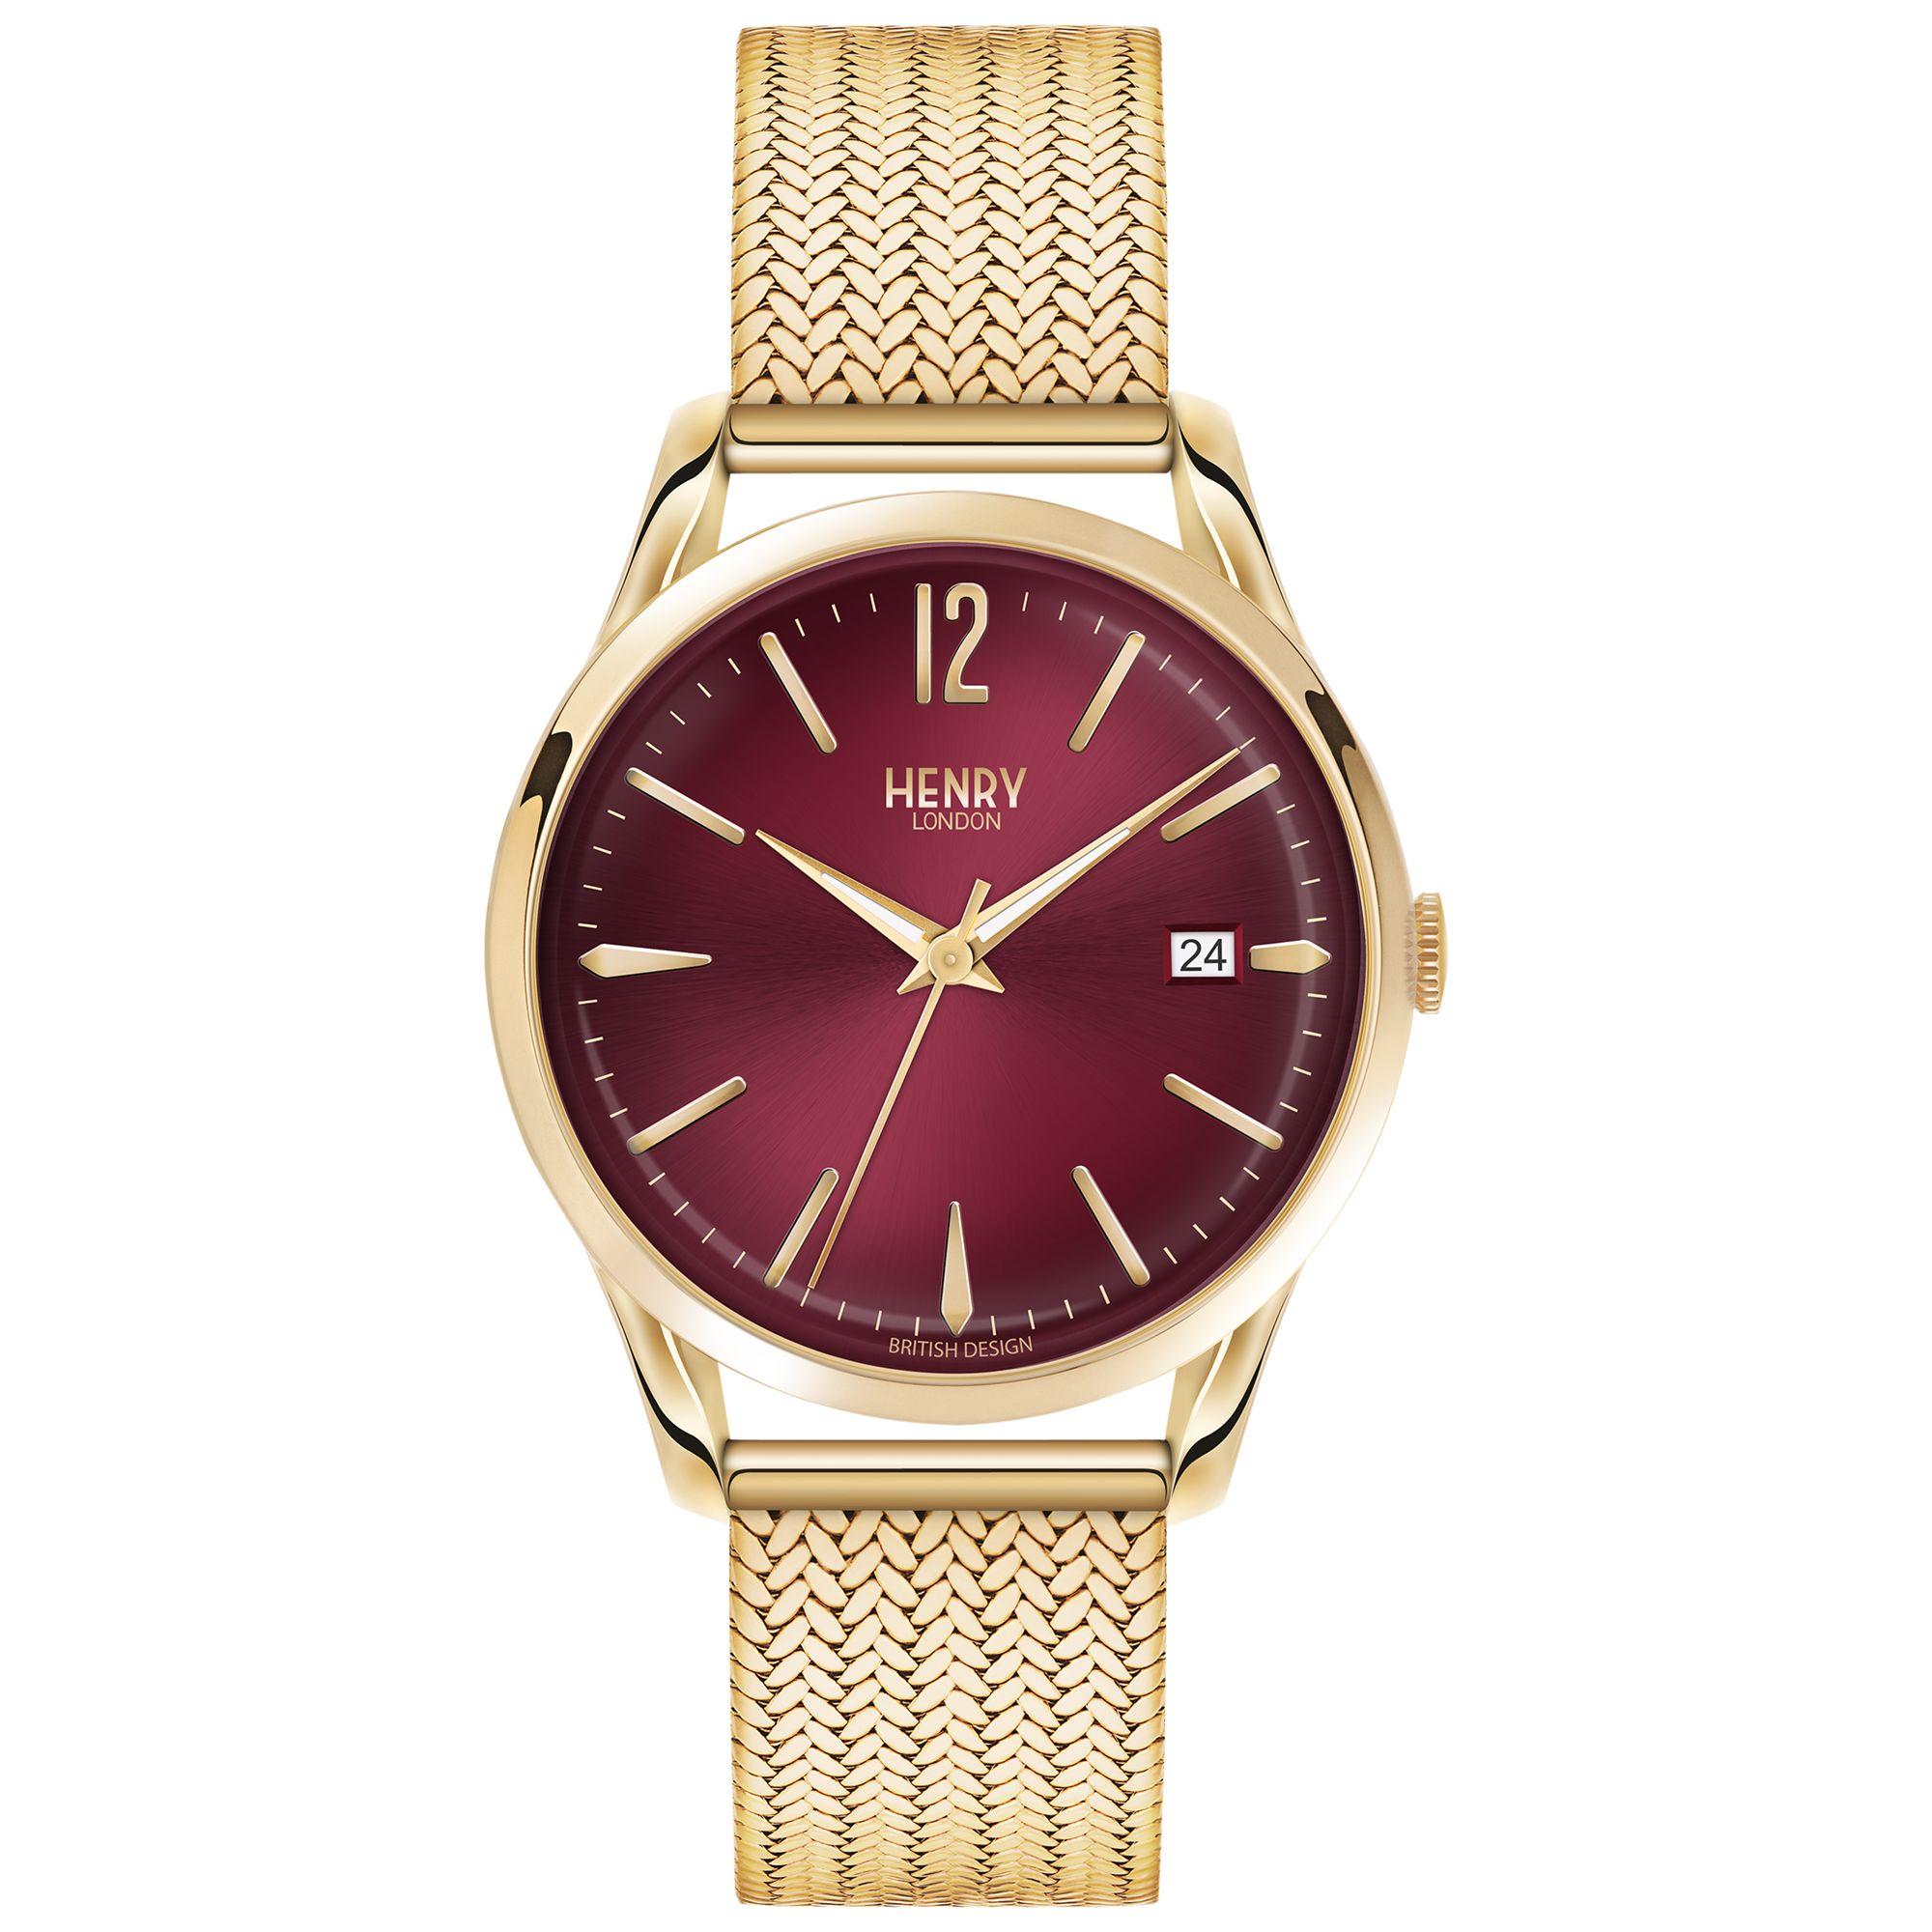 Henry London Henry London HL39-M-0062 Women's Holborn Date Bracelet Strap Watch, Gold/Claret